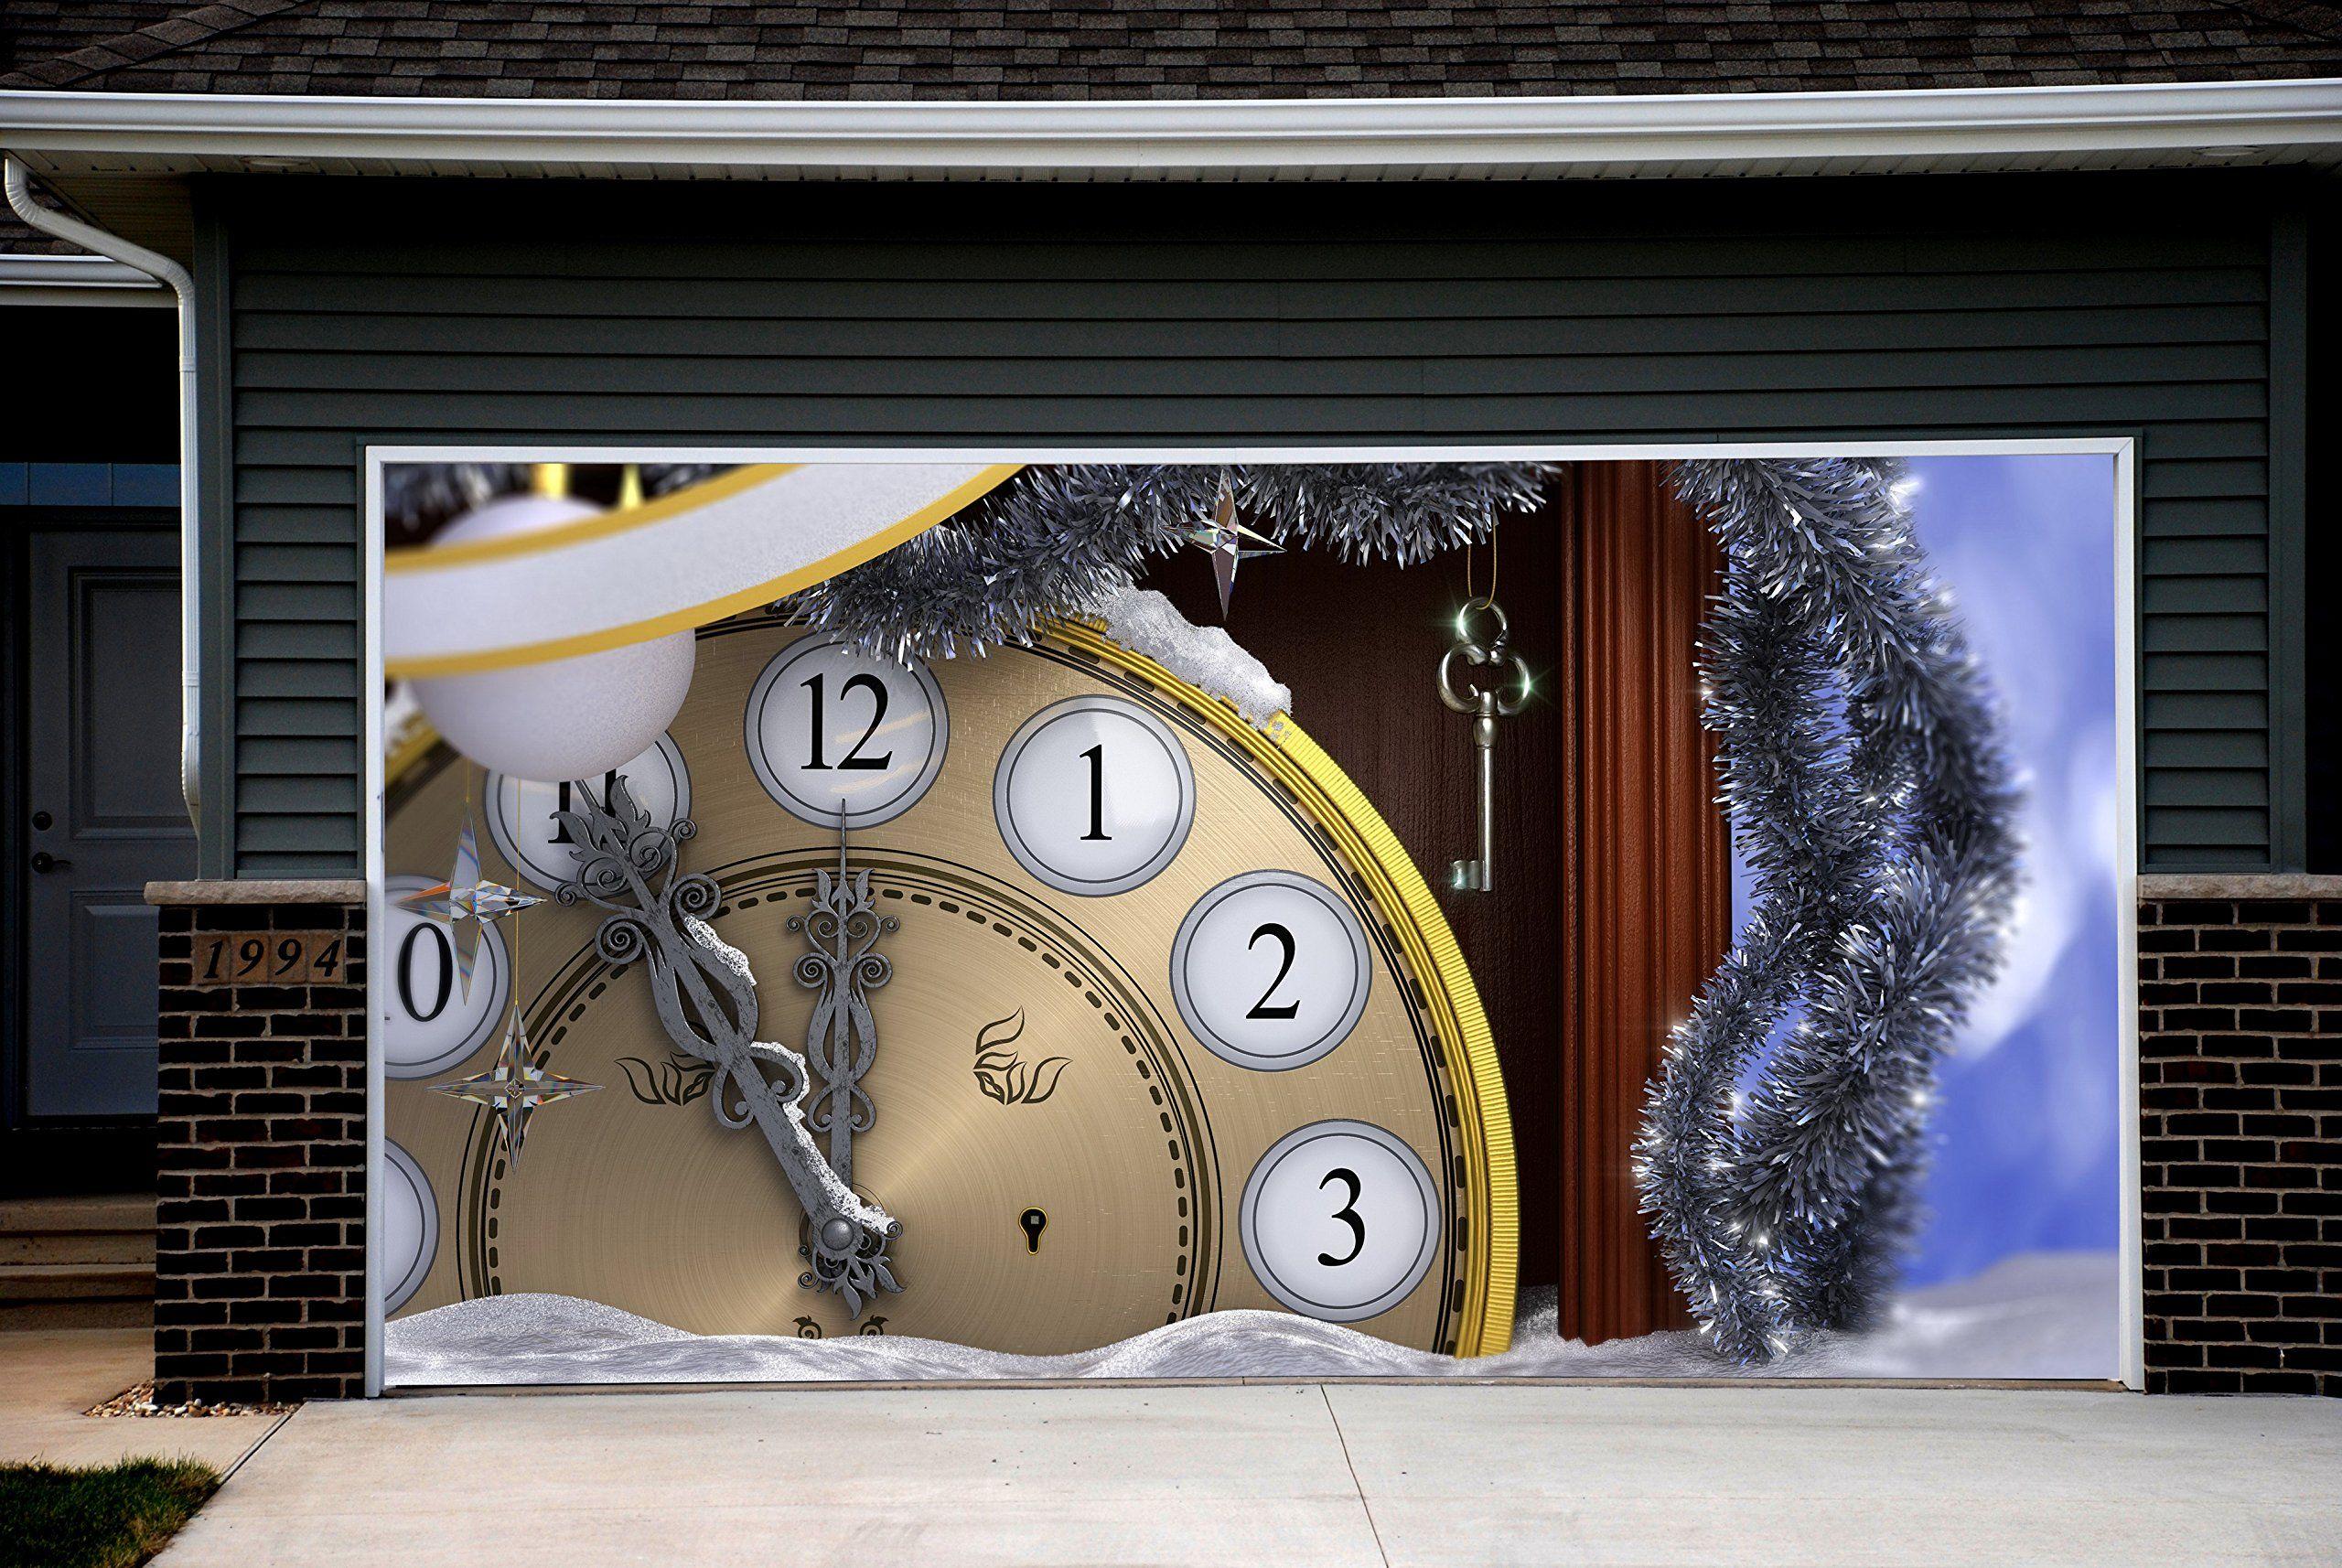 decorative magnetic toronto doors design designs for kits fluidelectric garage hardware best ideas door decorations great of